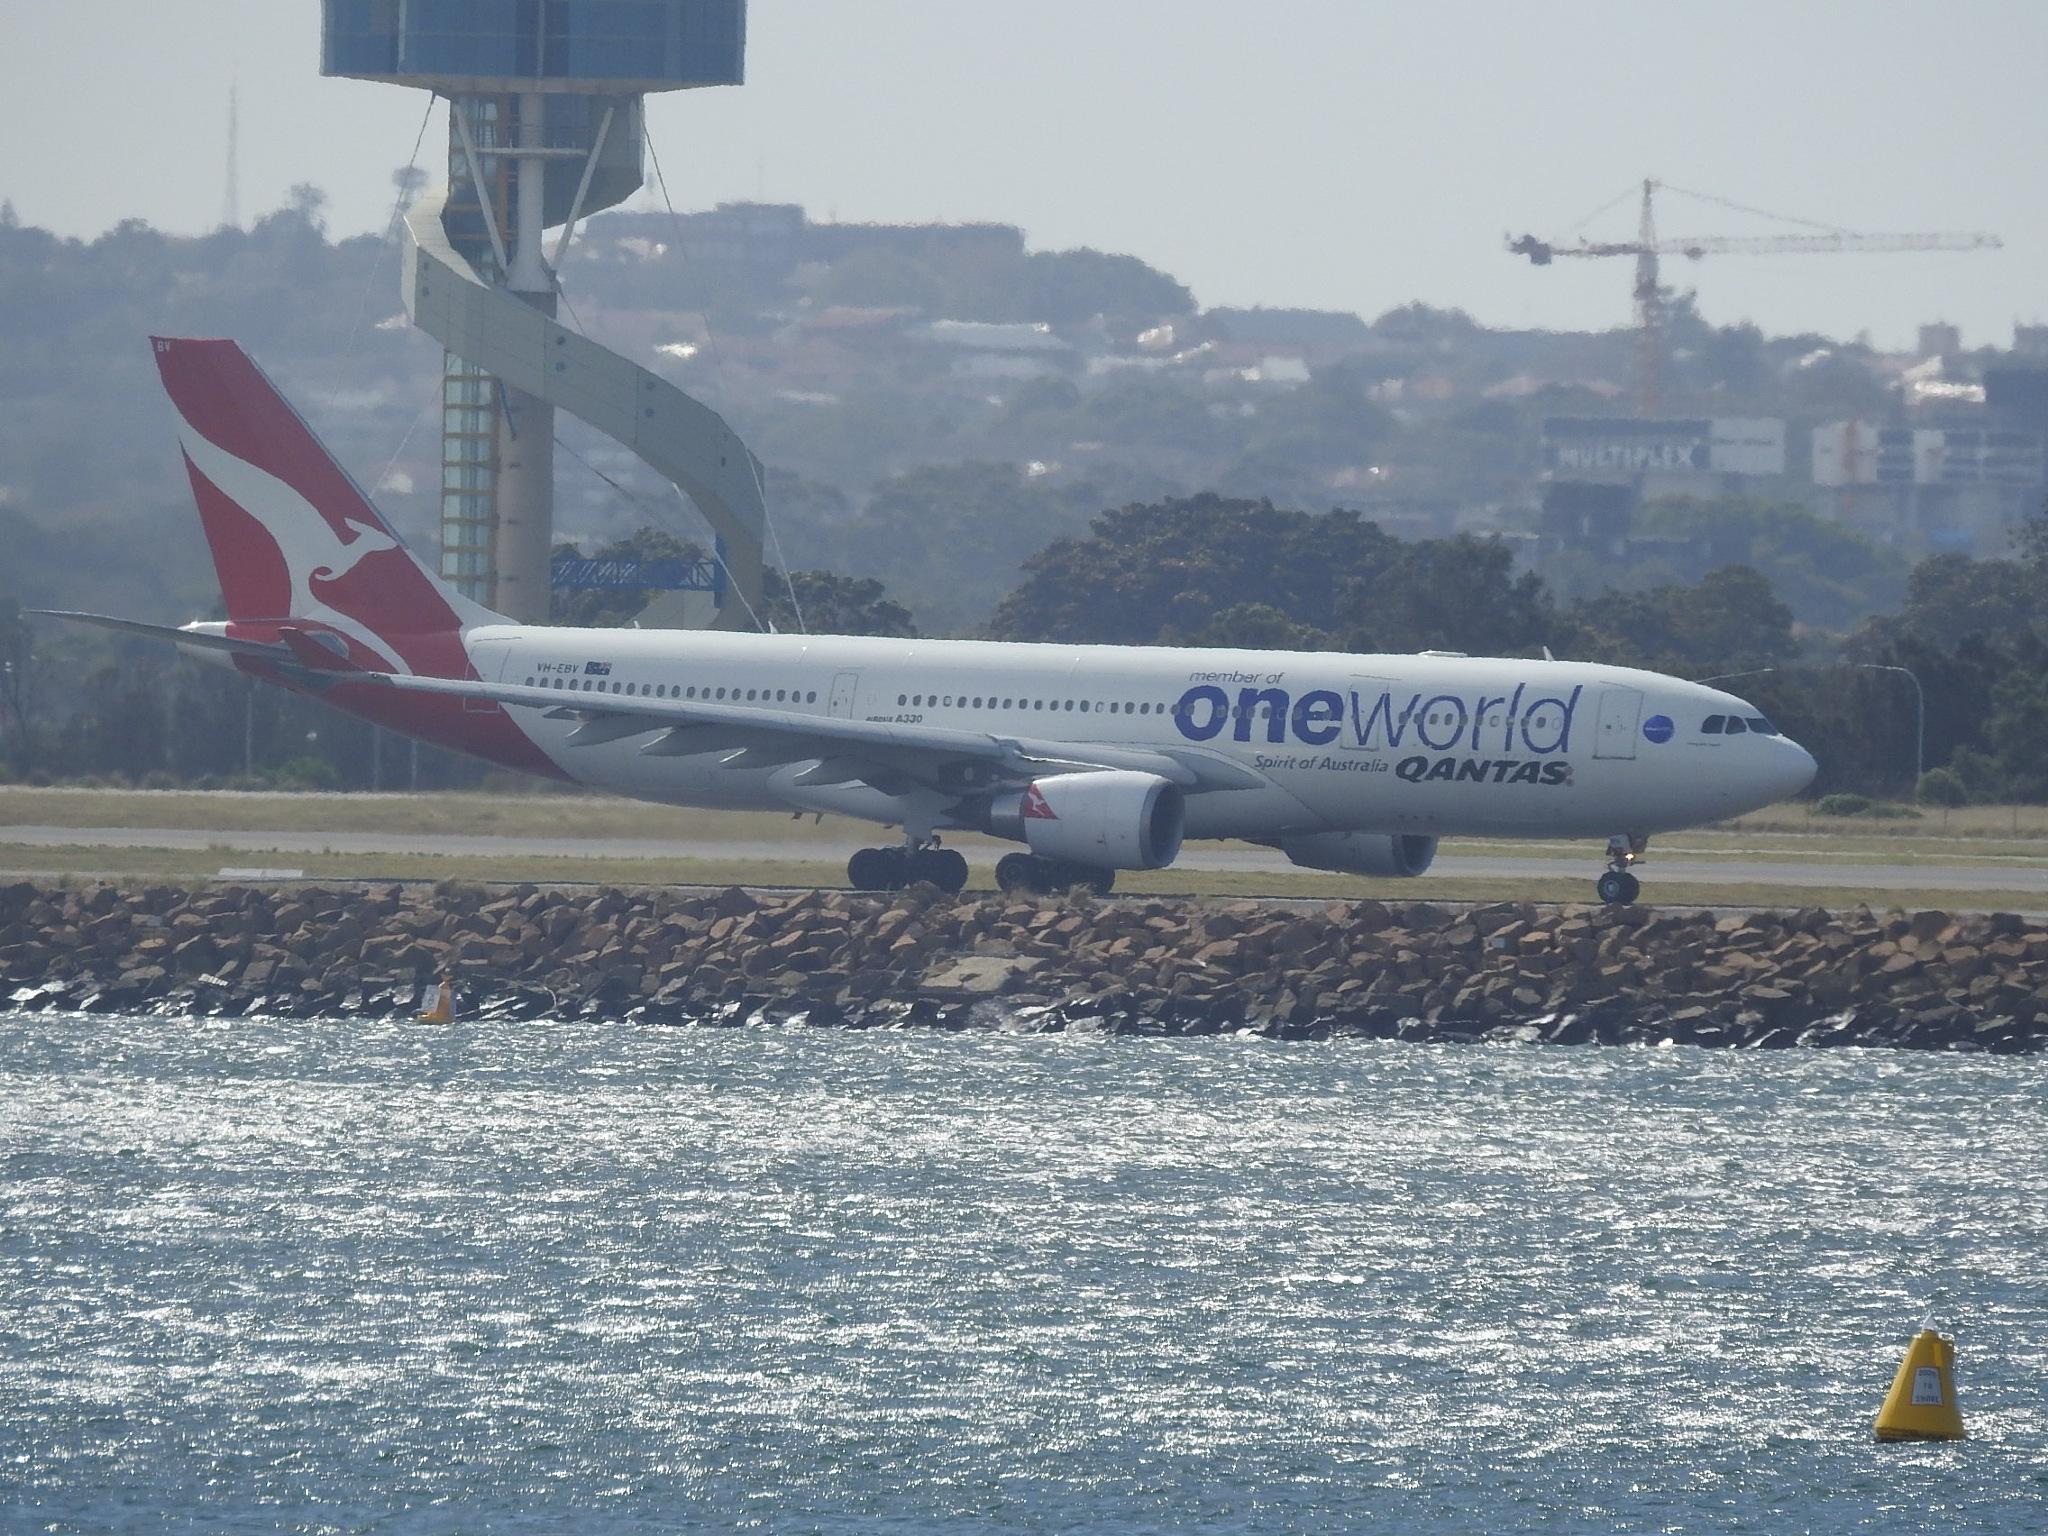 Qantas by Michael De St Pern